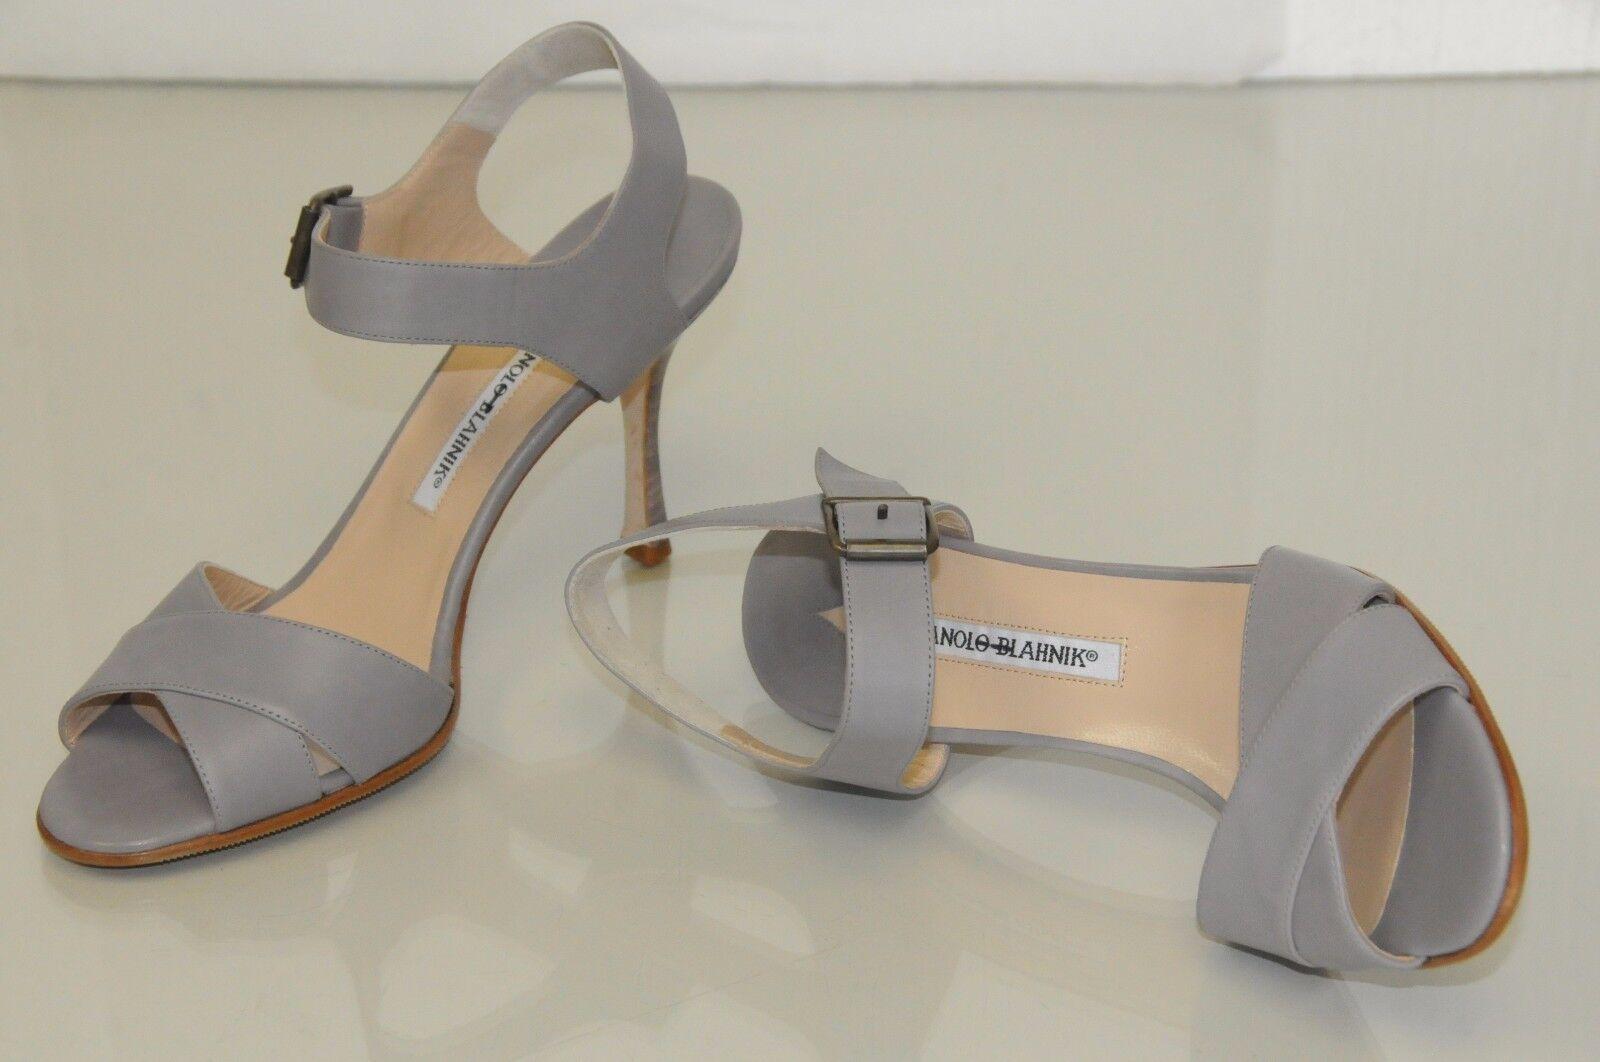 New Manolo Blahnik GREY Matte Leather Sandals shoes Hells Hells Hells 40.5 46bb24